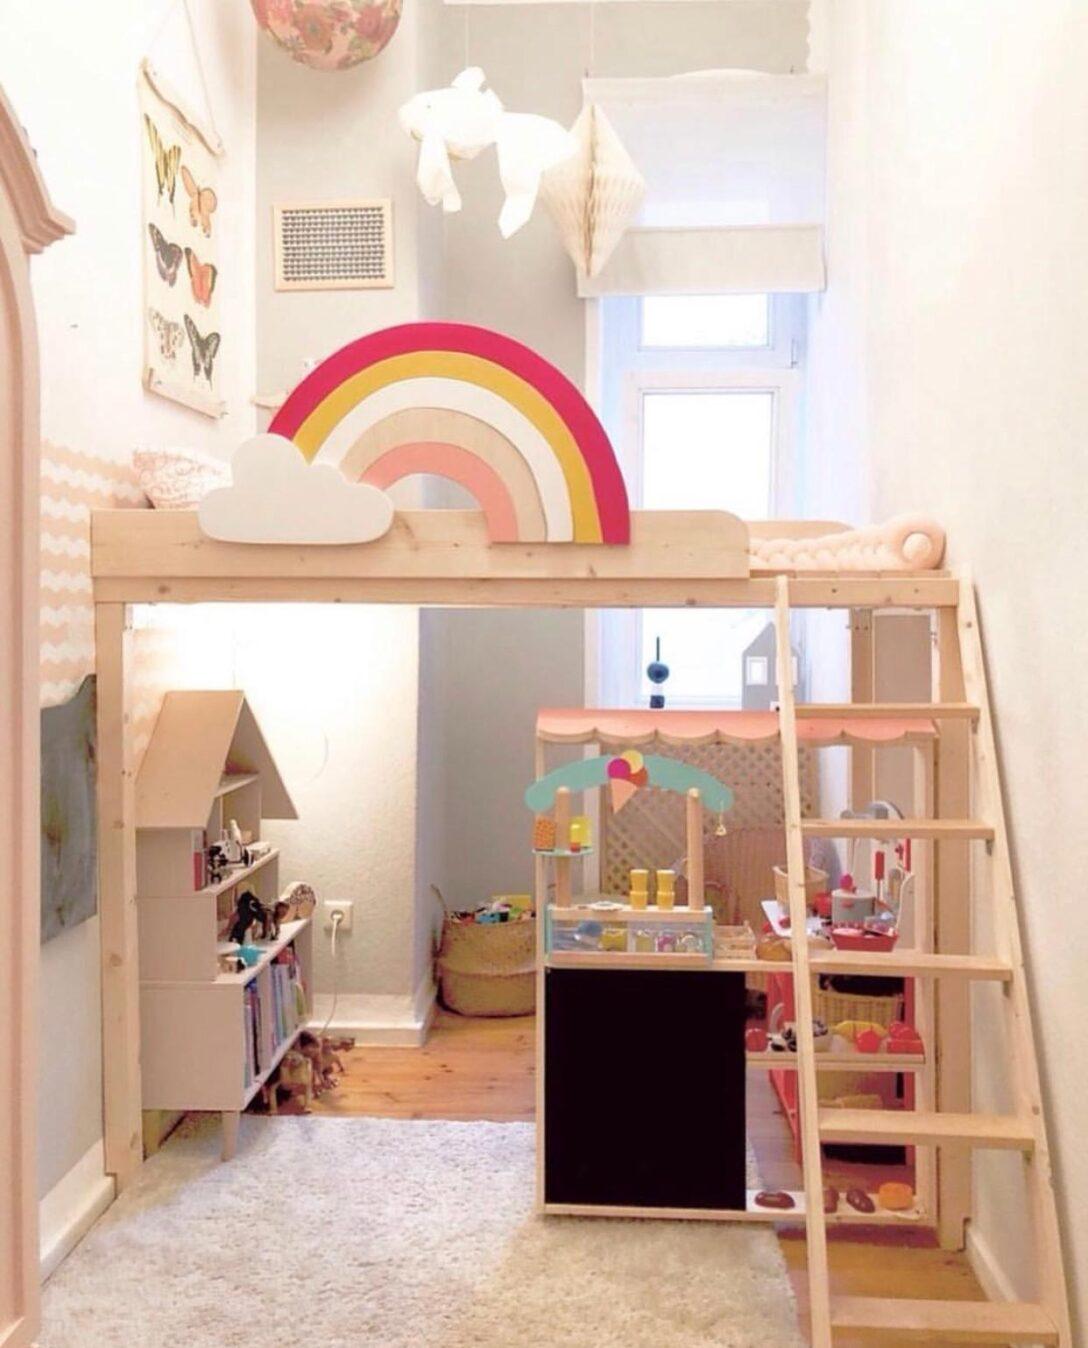 Large Size of Hochbett Kinderzimmer Sofa Regal Regale Weiß Kinderzimmer Hochbett Kinderzimmer